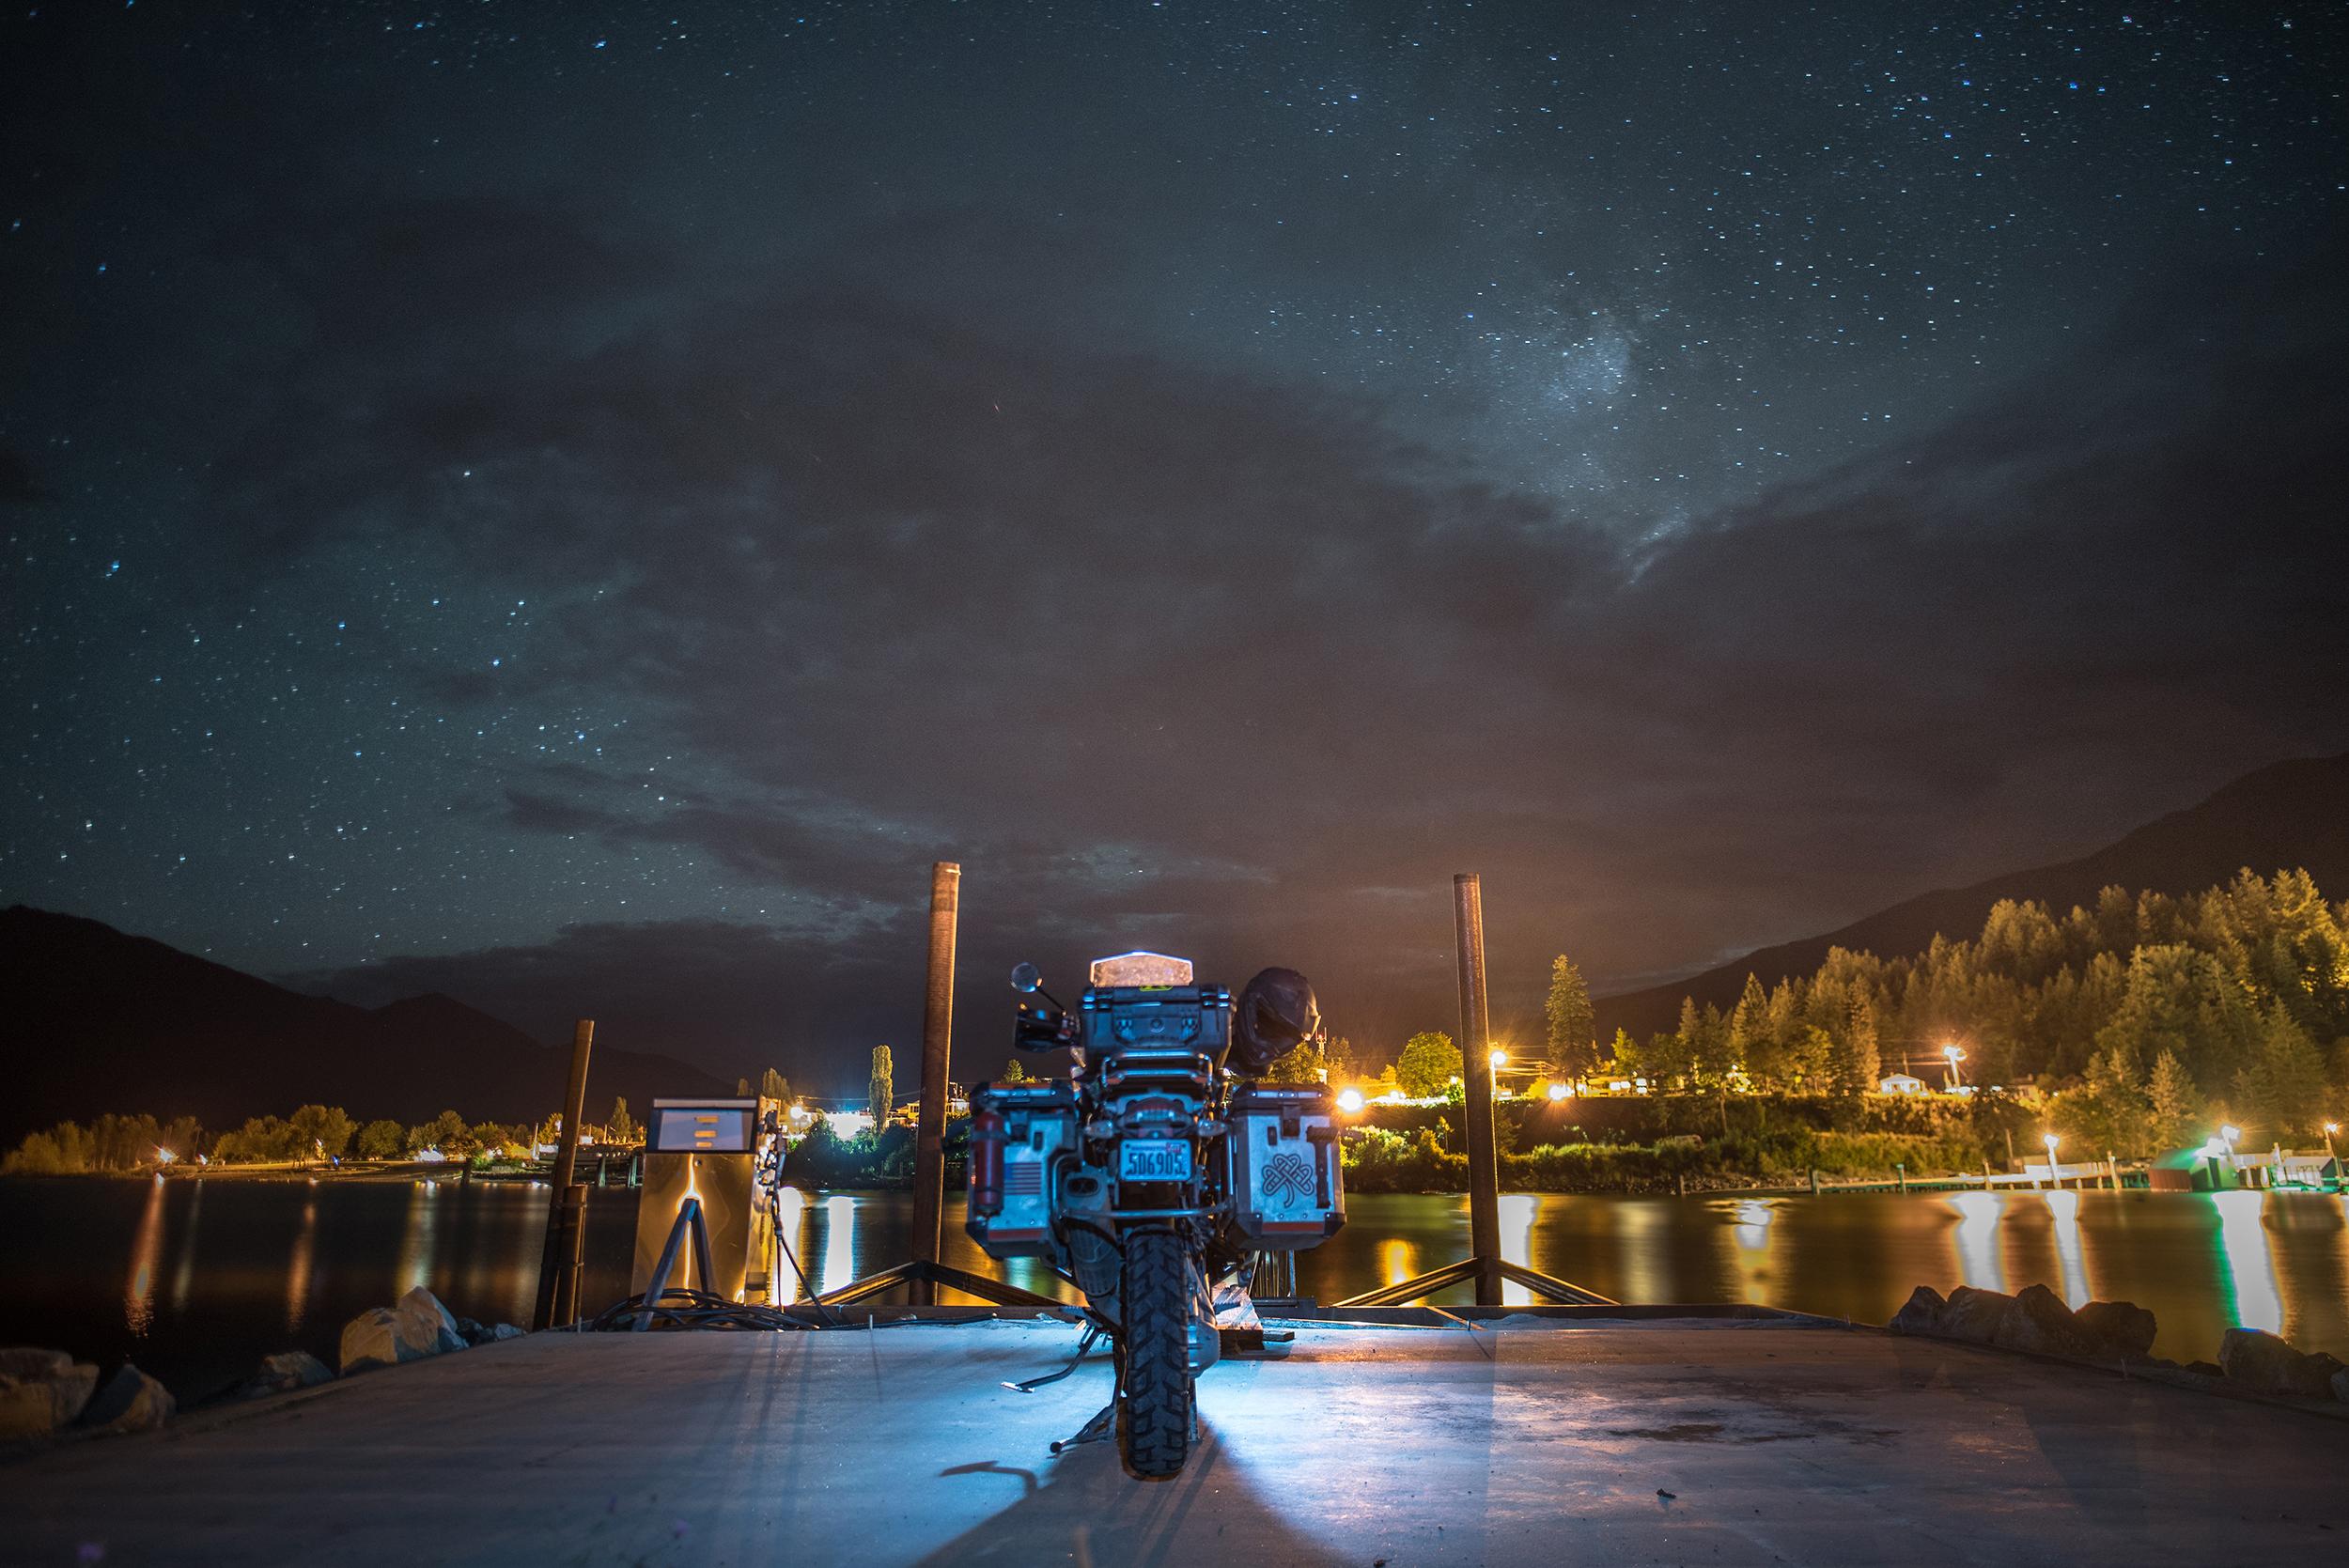 Tim-Burke-Canada-Trip-7105.jpg